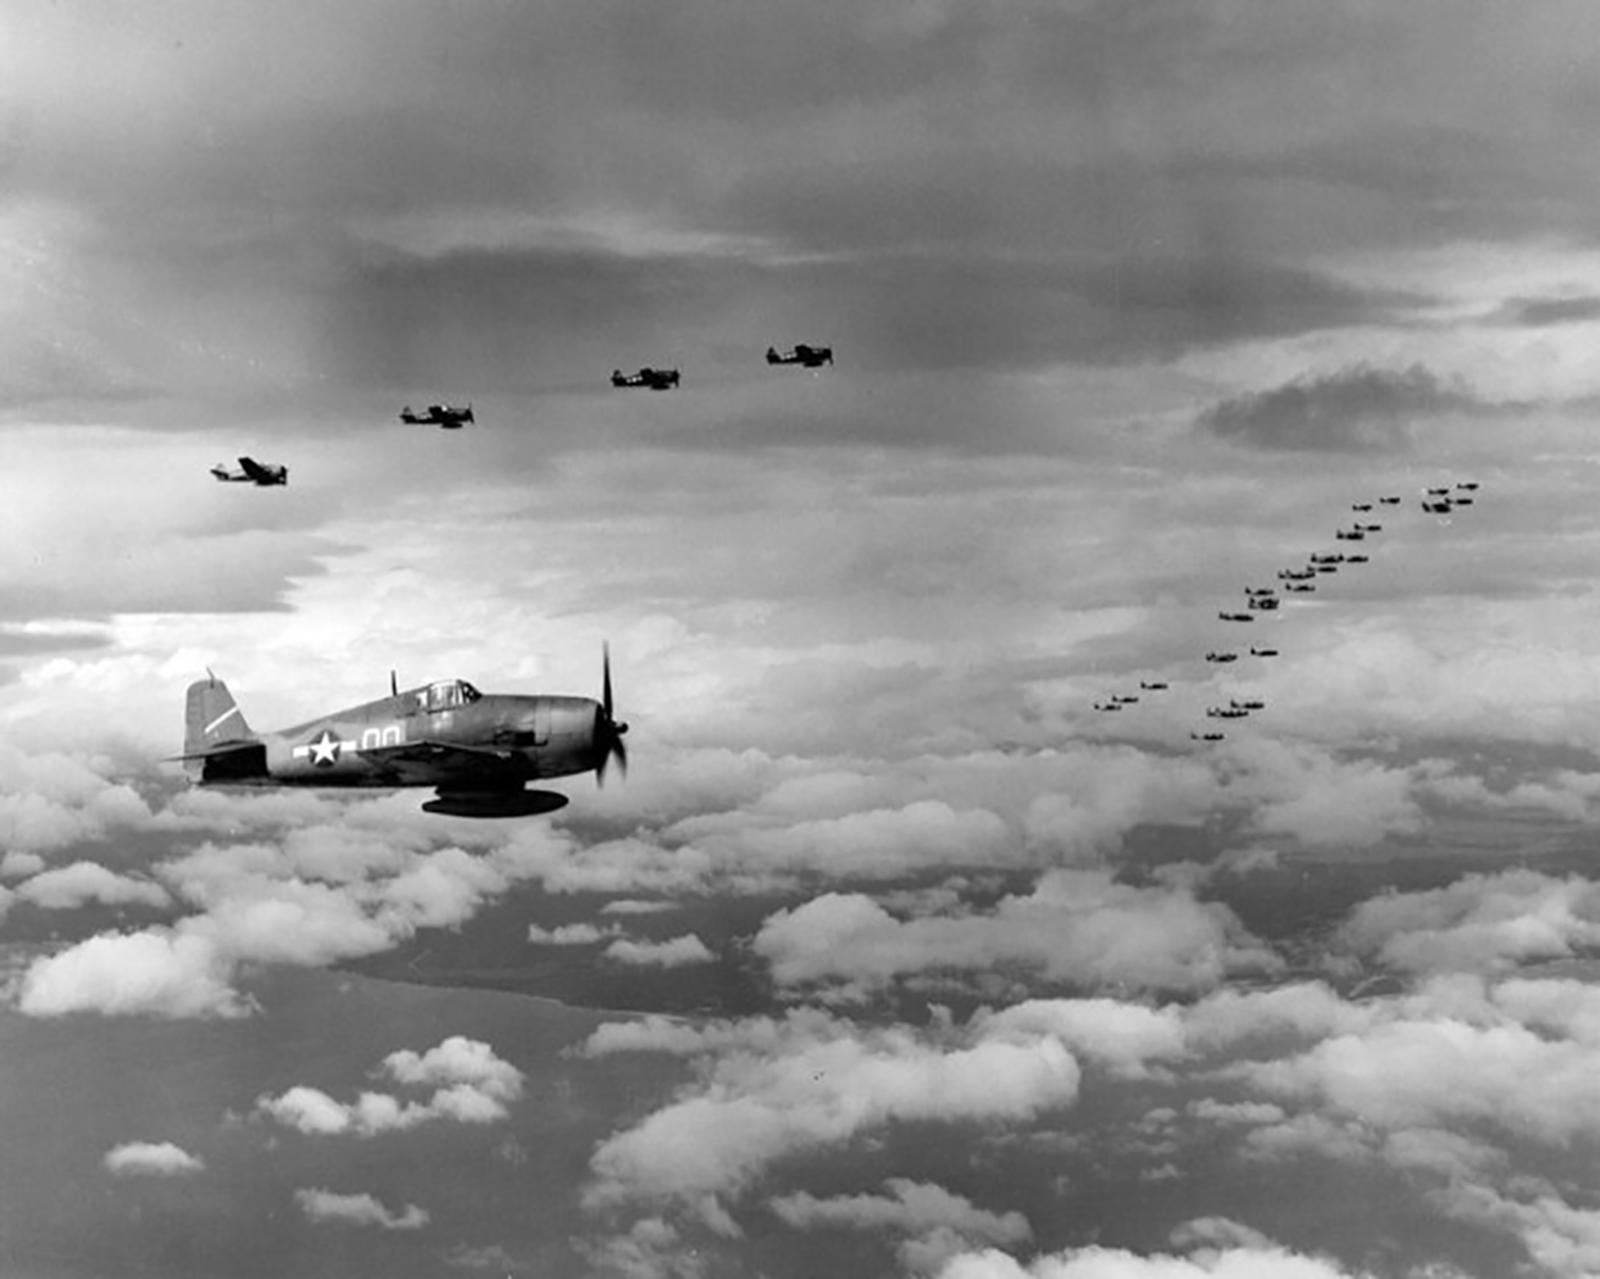 Grumman F6F 3 Hellcat VF 5 White 00 Marcus Island raid CV 10 USS Yorktown 1943 03